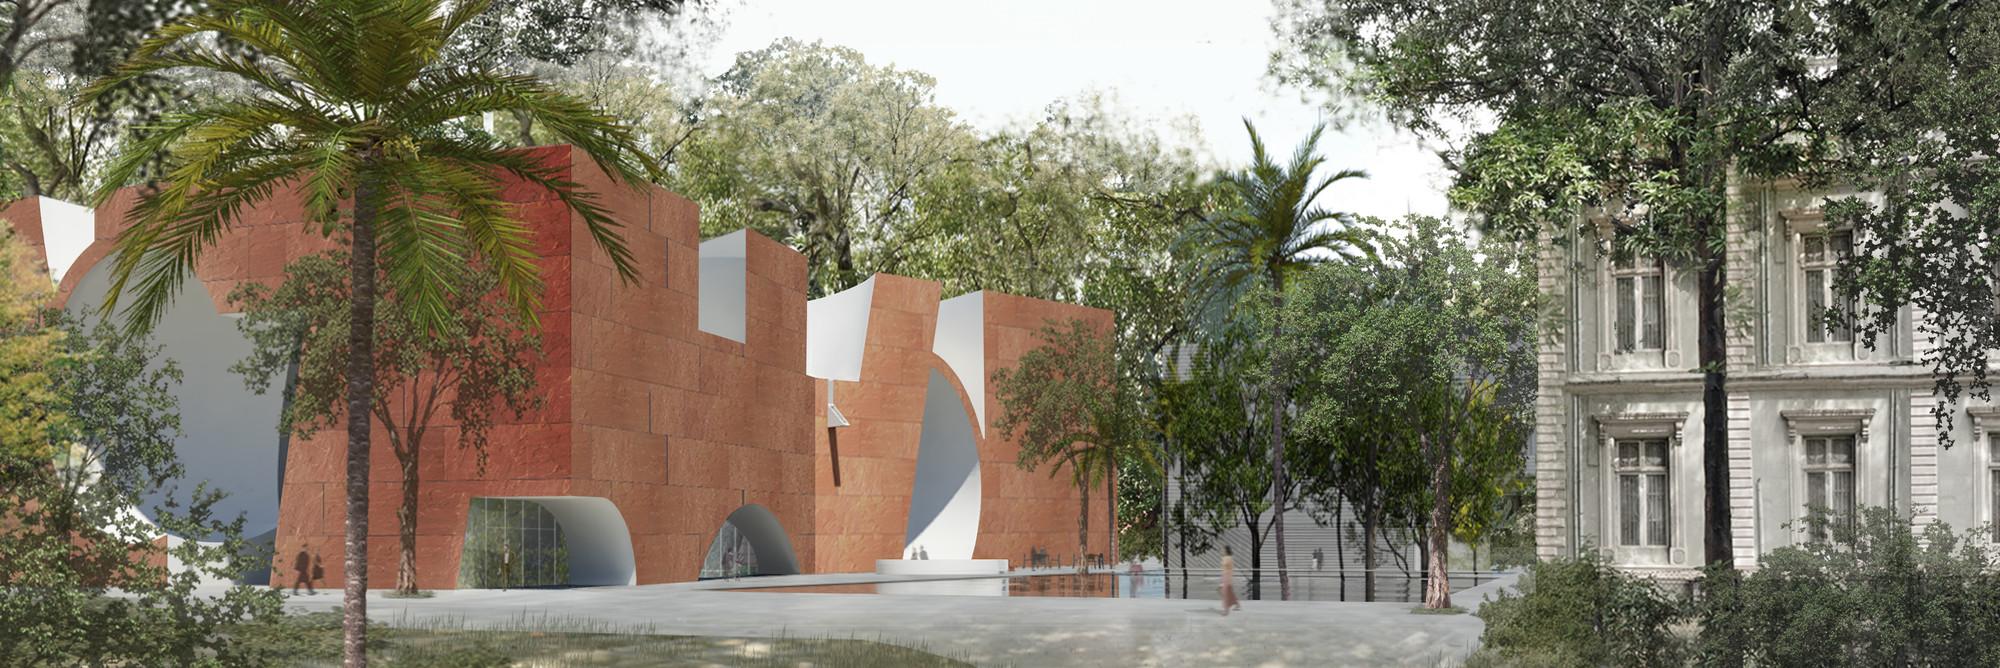 Steven Holl vence concurso para projetar nova ala do Museu Municipal de Mumbai, © Steven Holl Architects